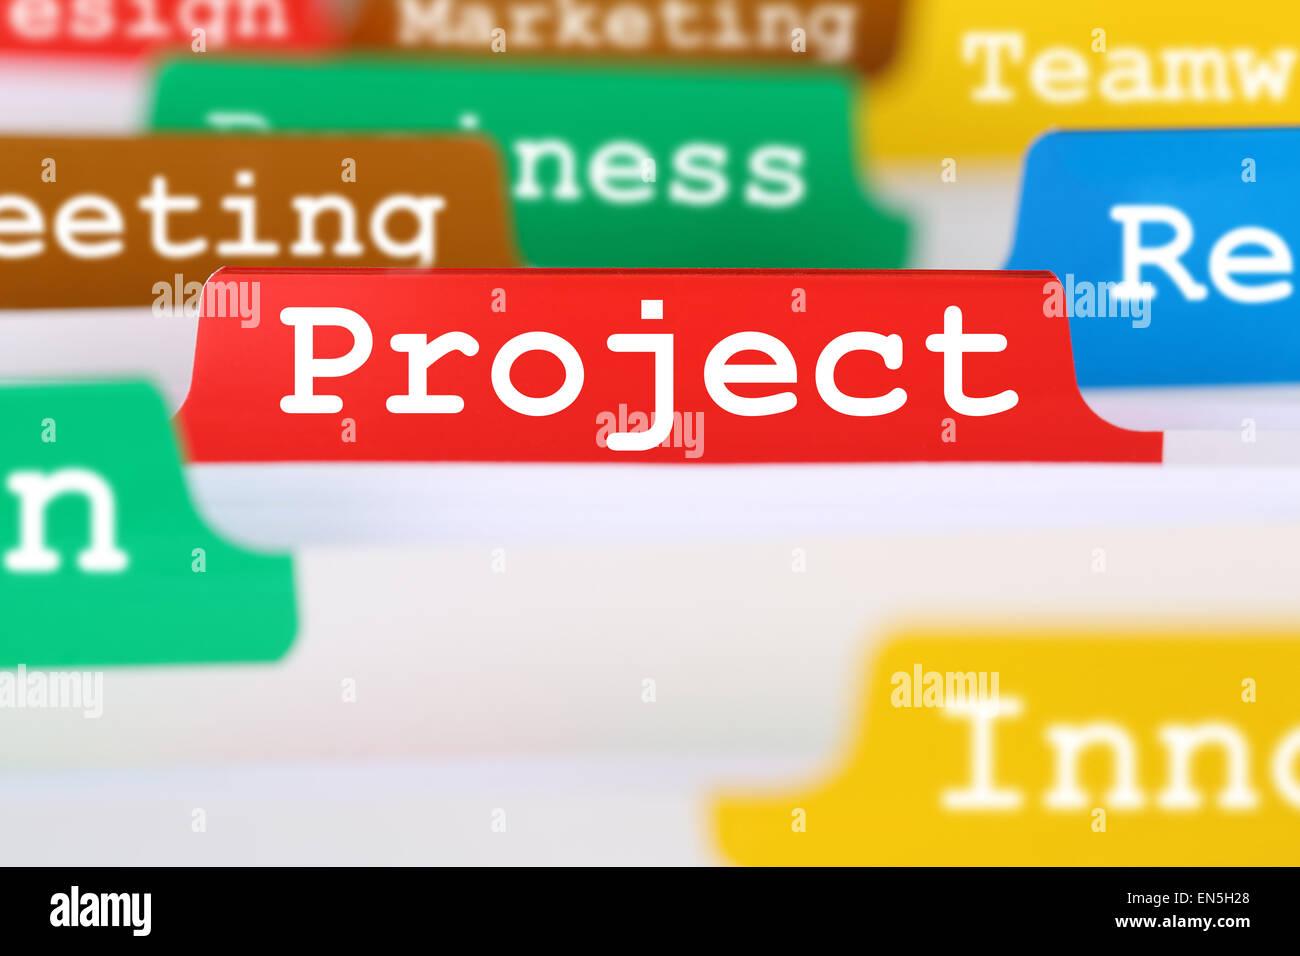 Projektorganisation Konzept arbeiten Büro Text auf Register in Geschäftsdokumente Stockbild